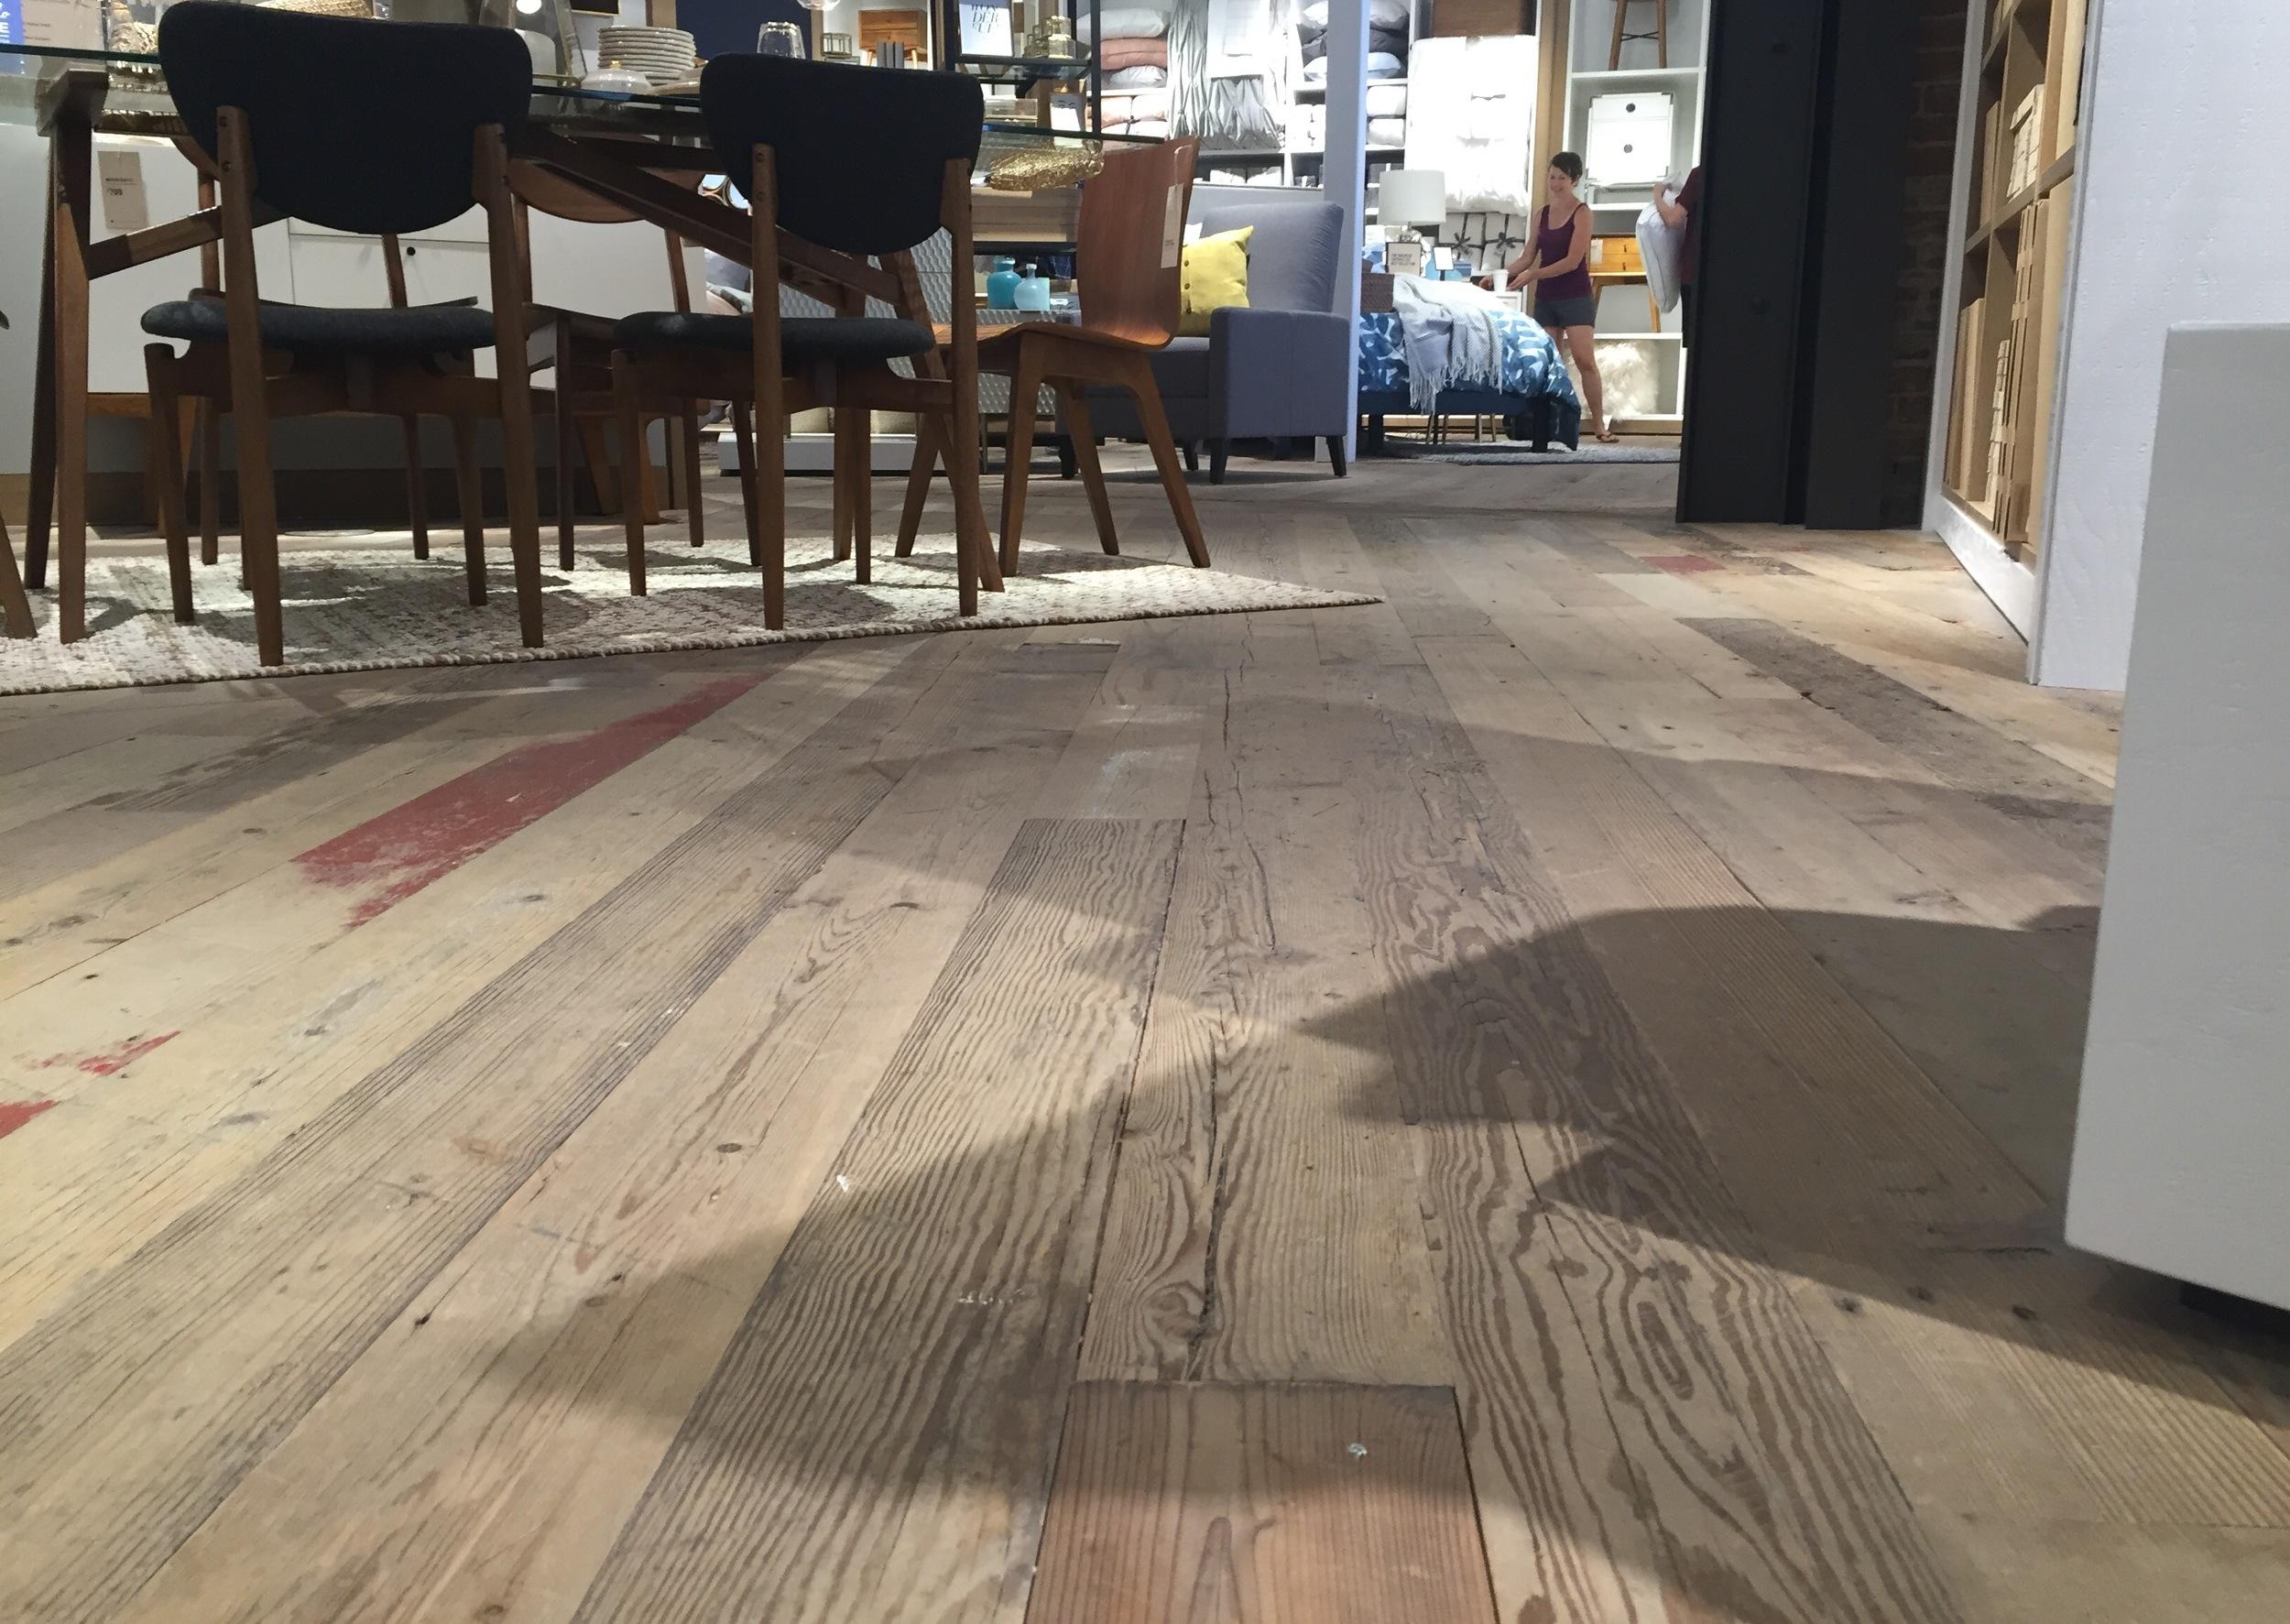 The floors even creak!